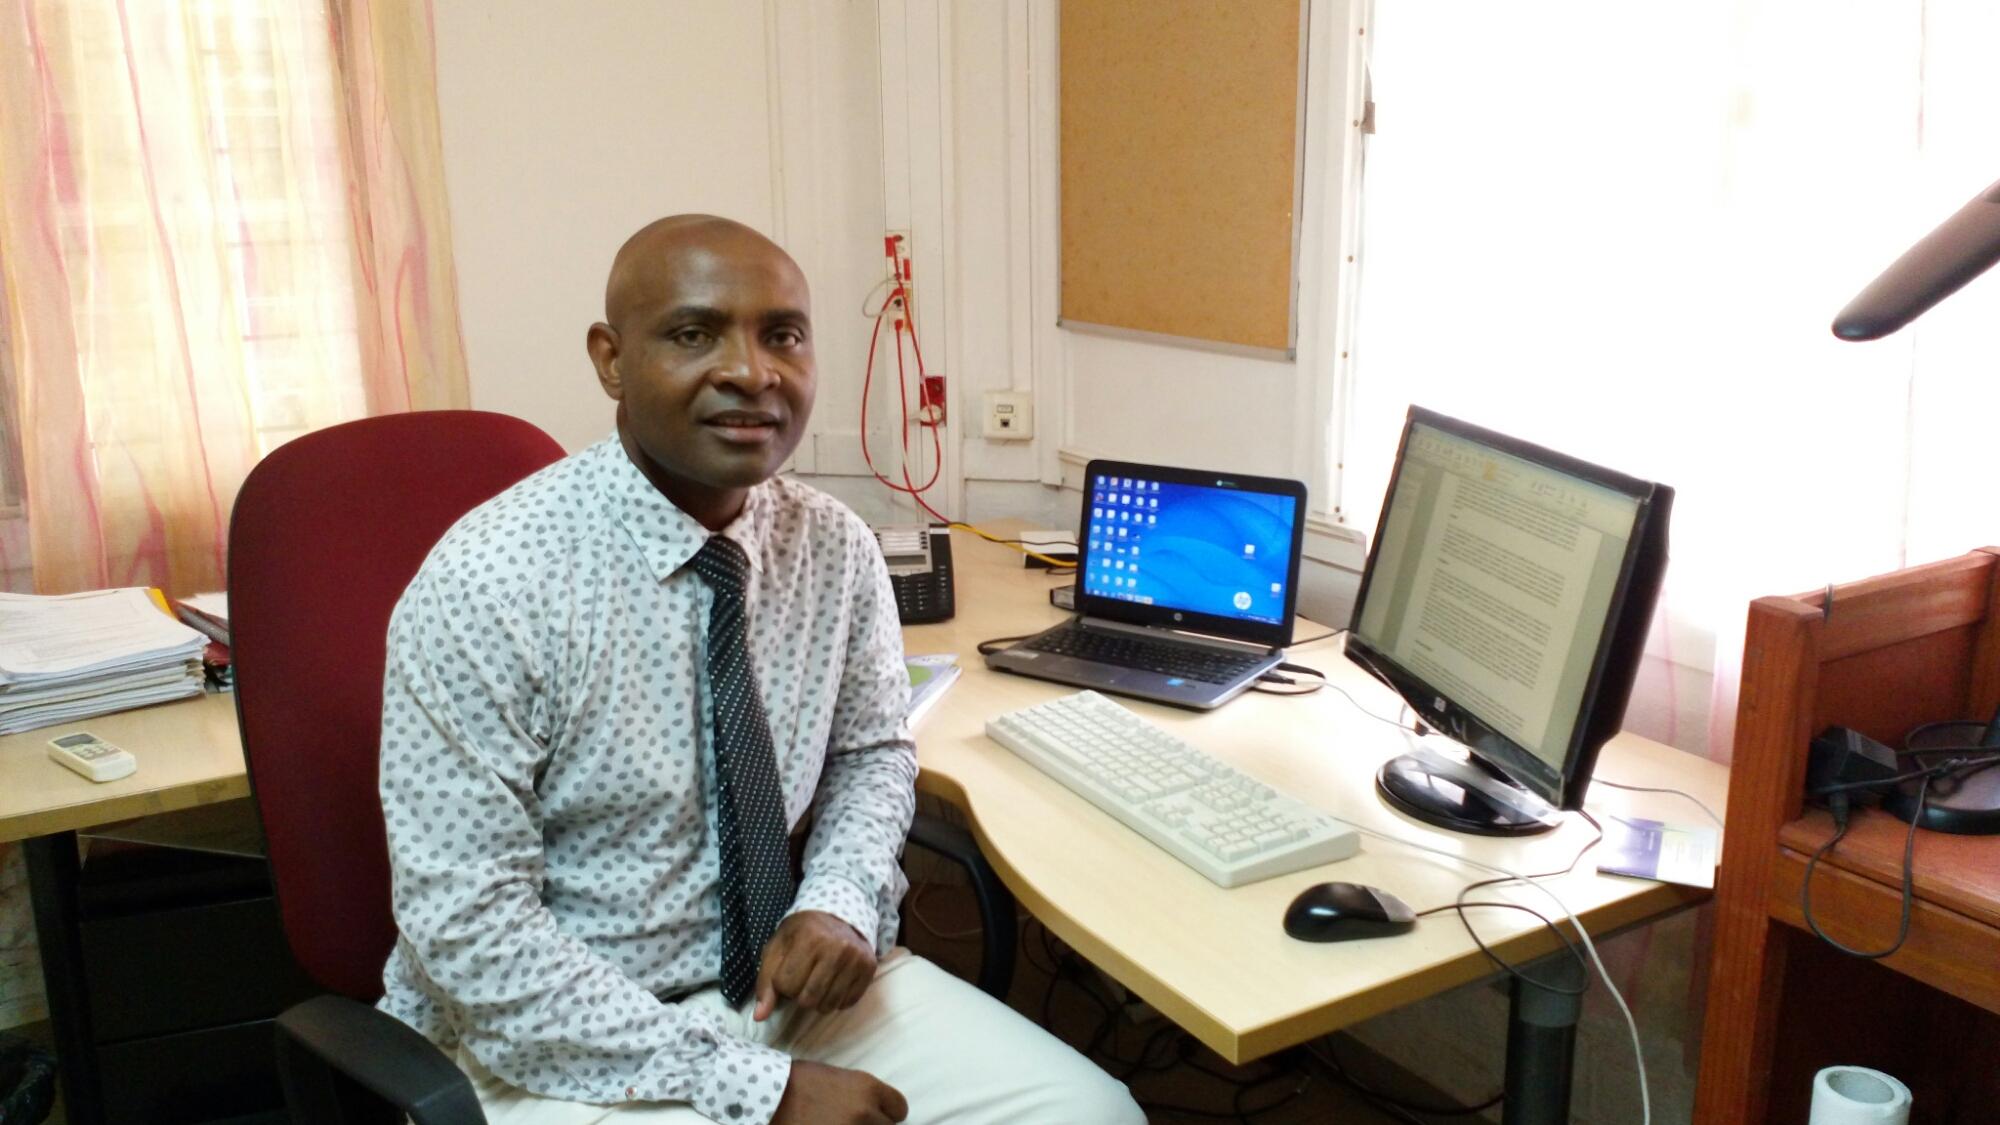 Dr Youssouf Hassani